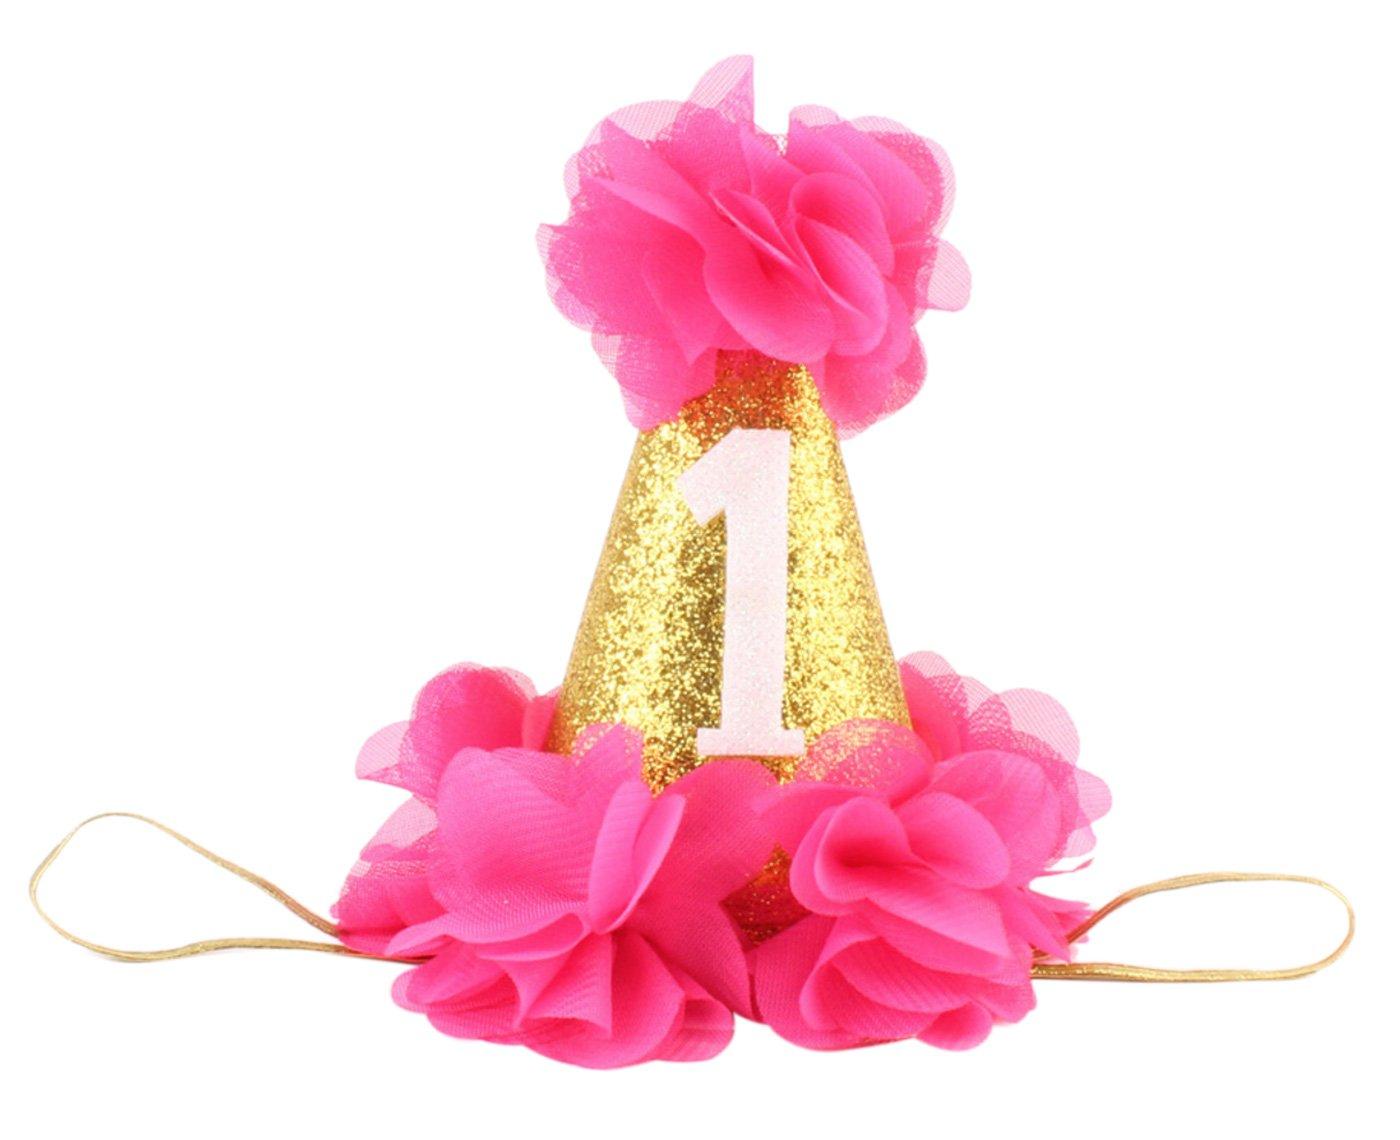 Infant Baby 1st Birthday Headband Sparkling Wedding Party Bridal Crown Delicate Prom Tiara Hair Accessories Ornaments with Golden Headband Pink Aivtalk FHBK1011